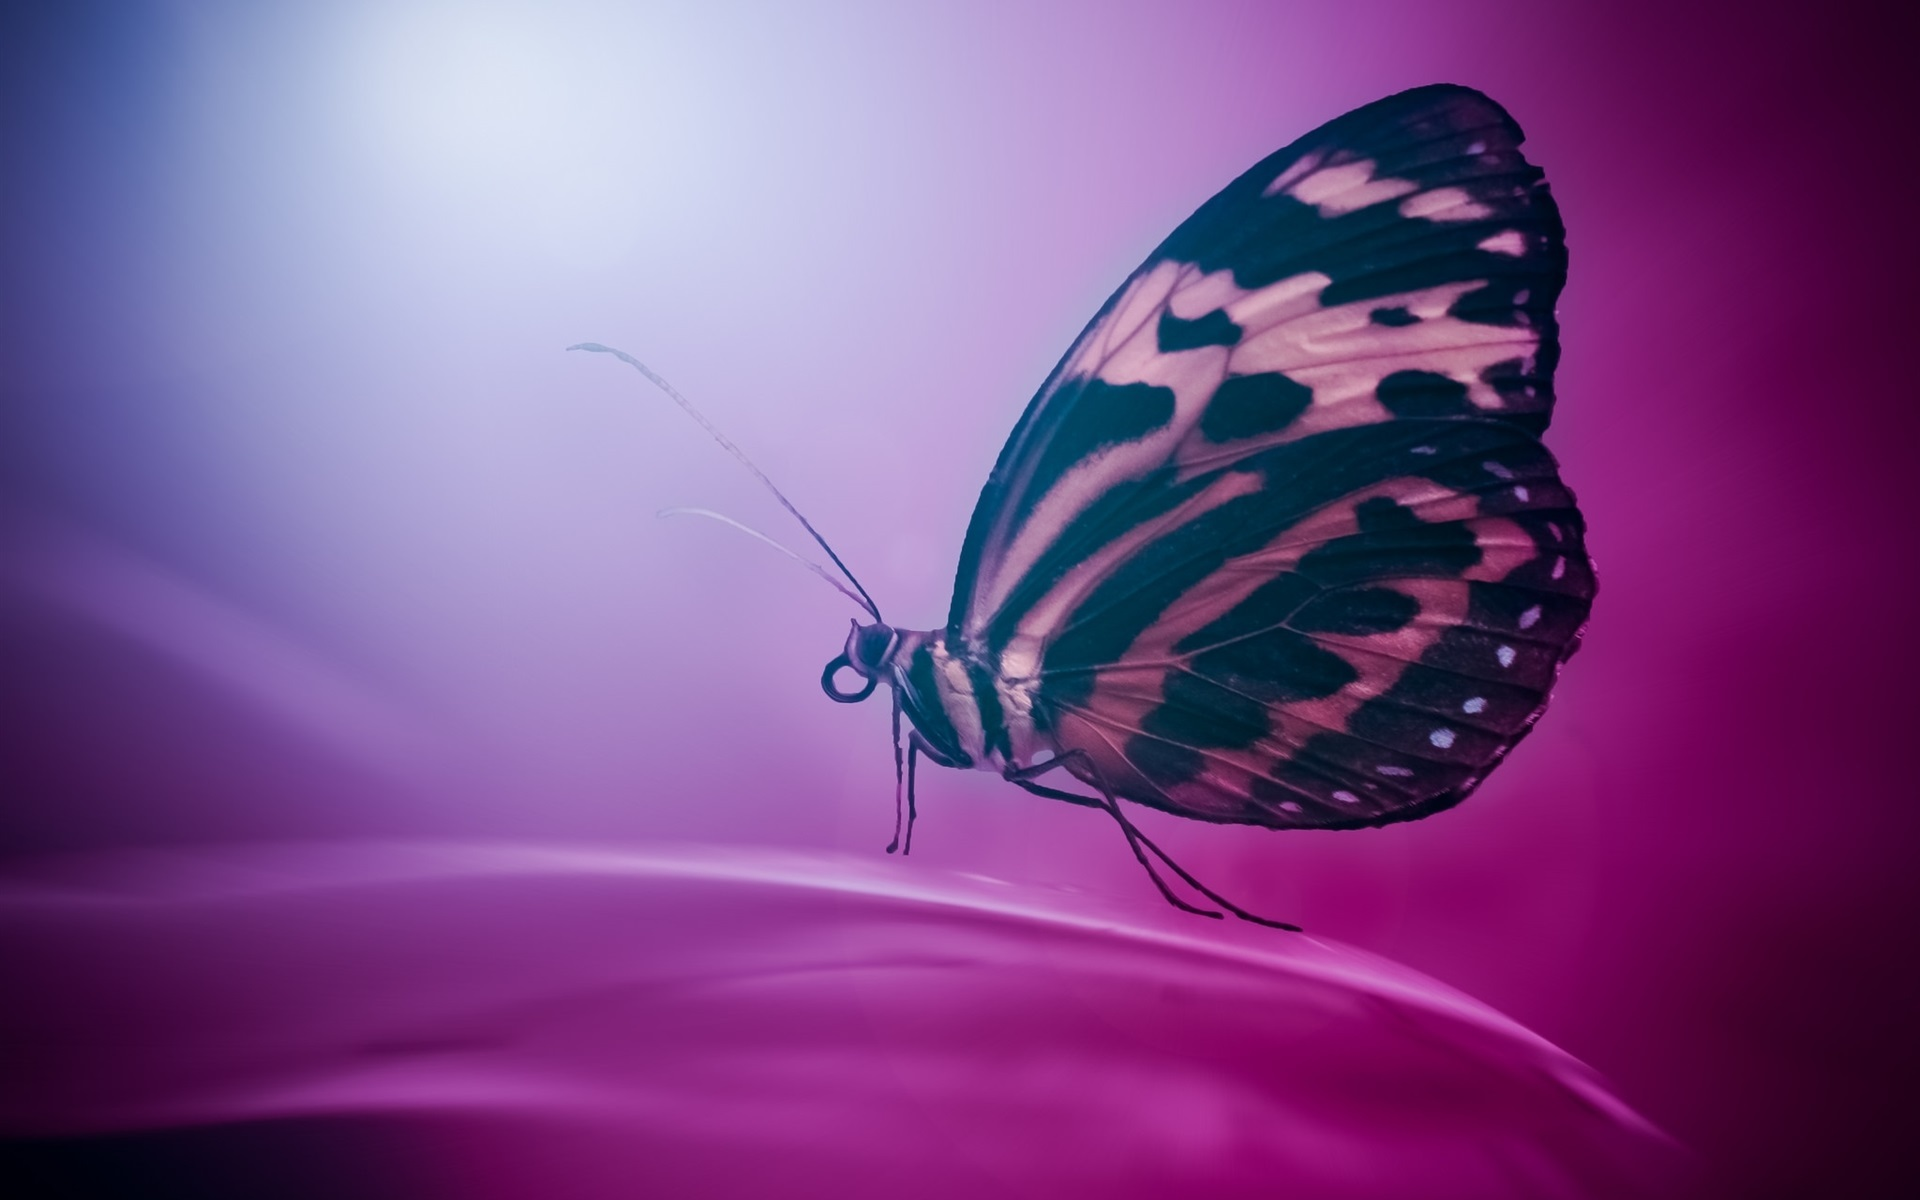 Image: Butterfly, wings, sitting, flower, color, purple